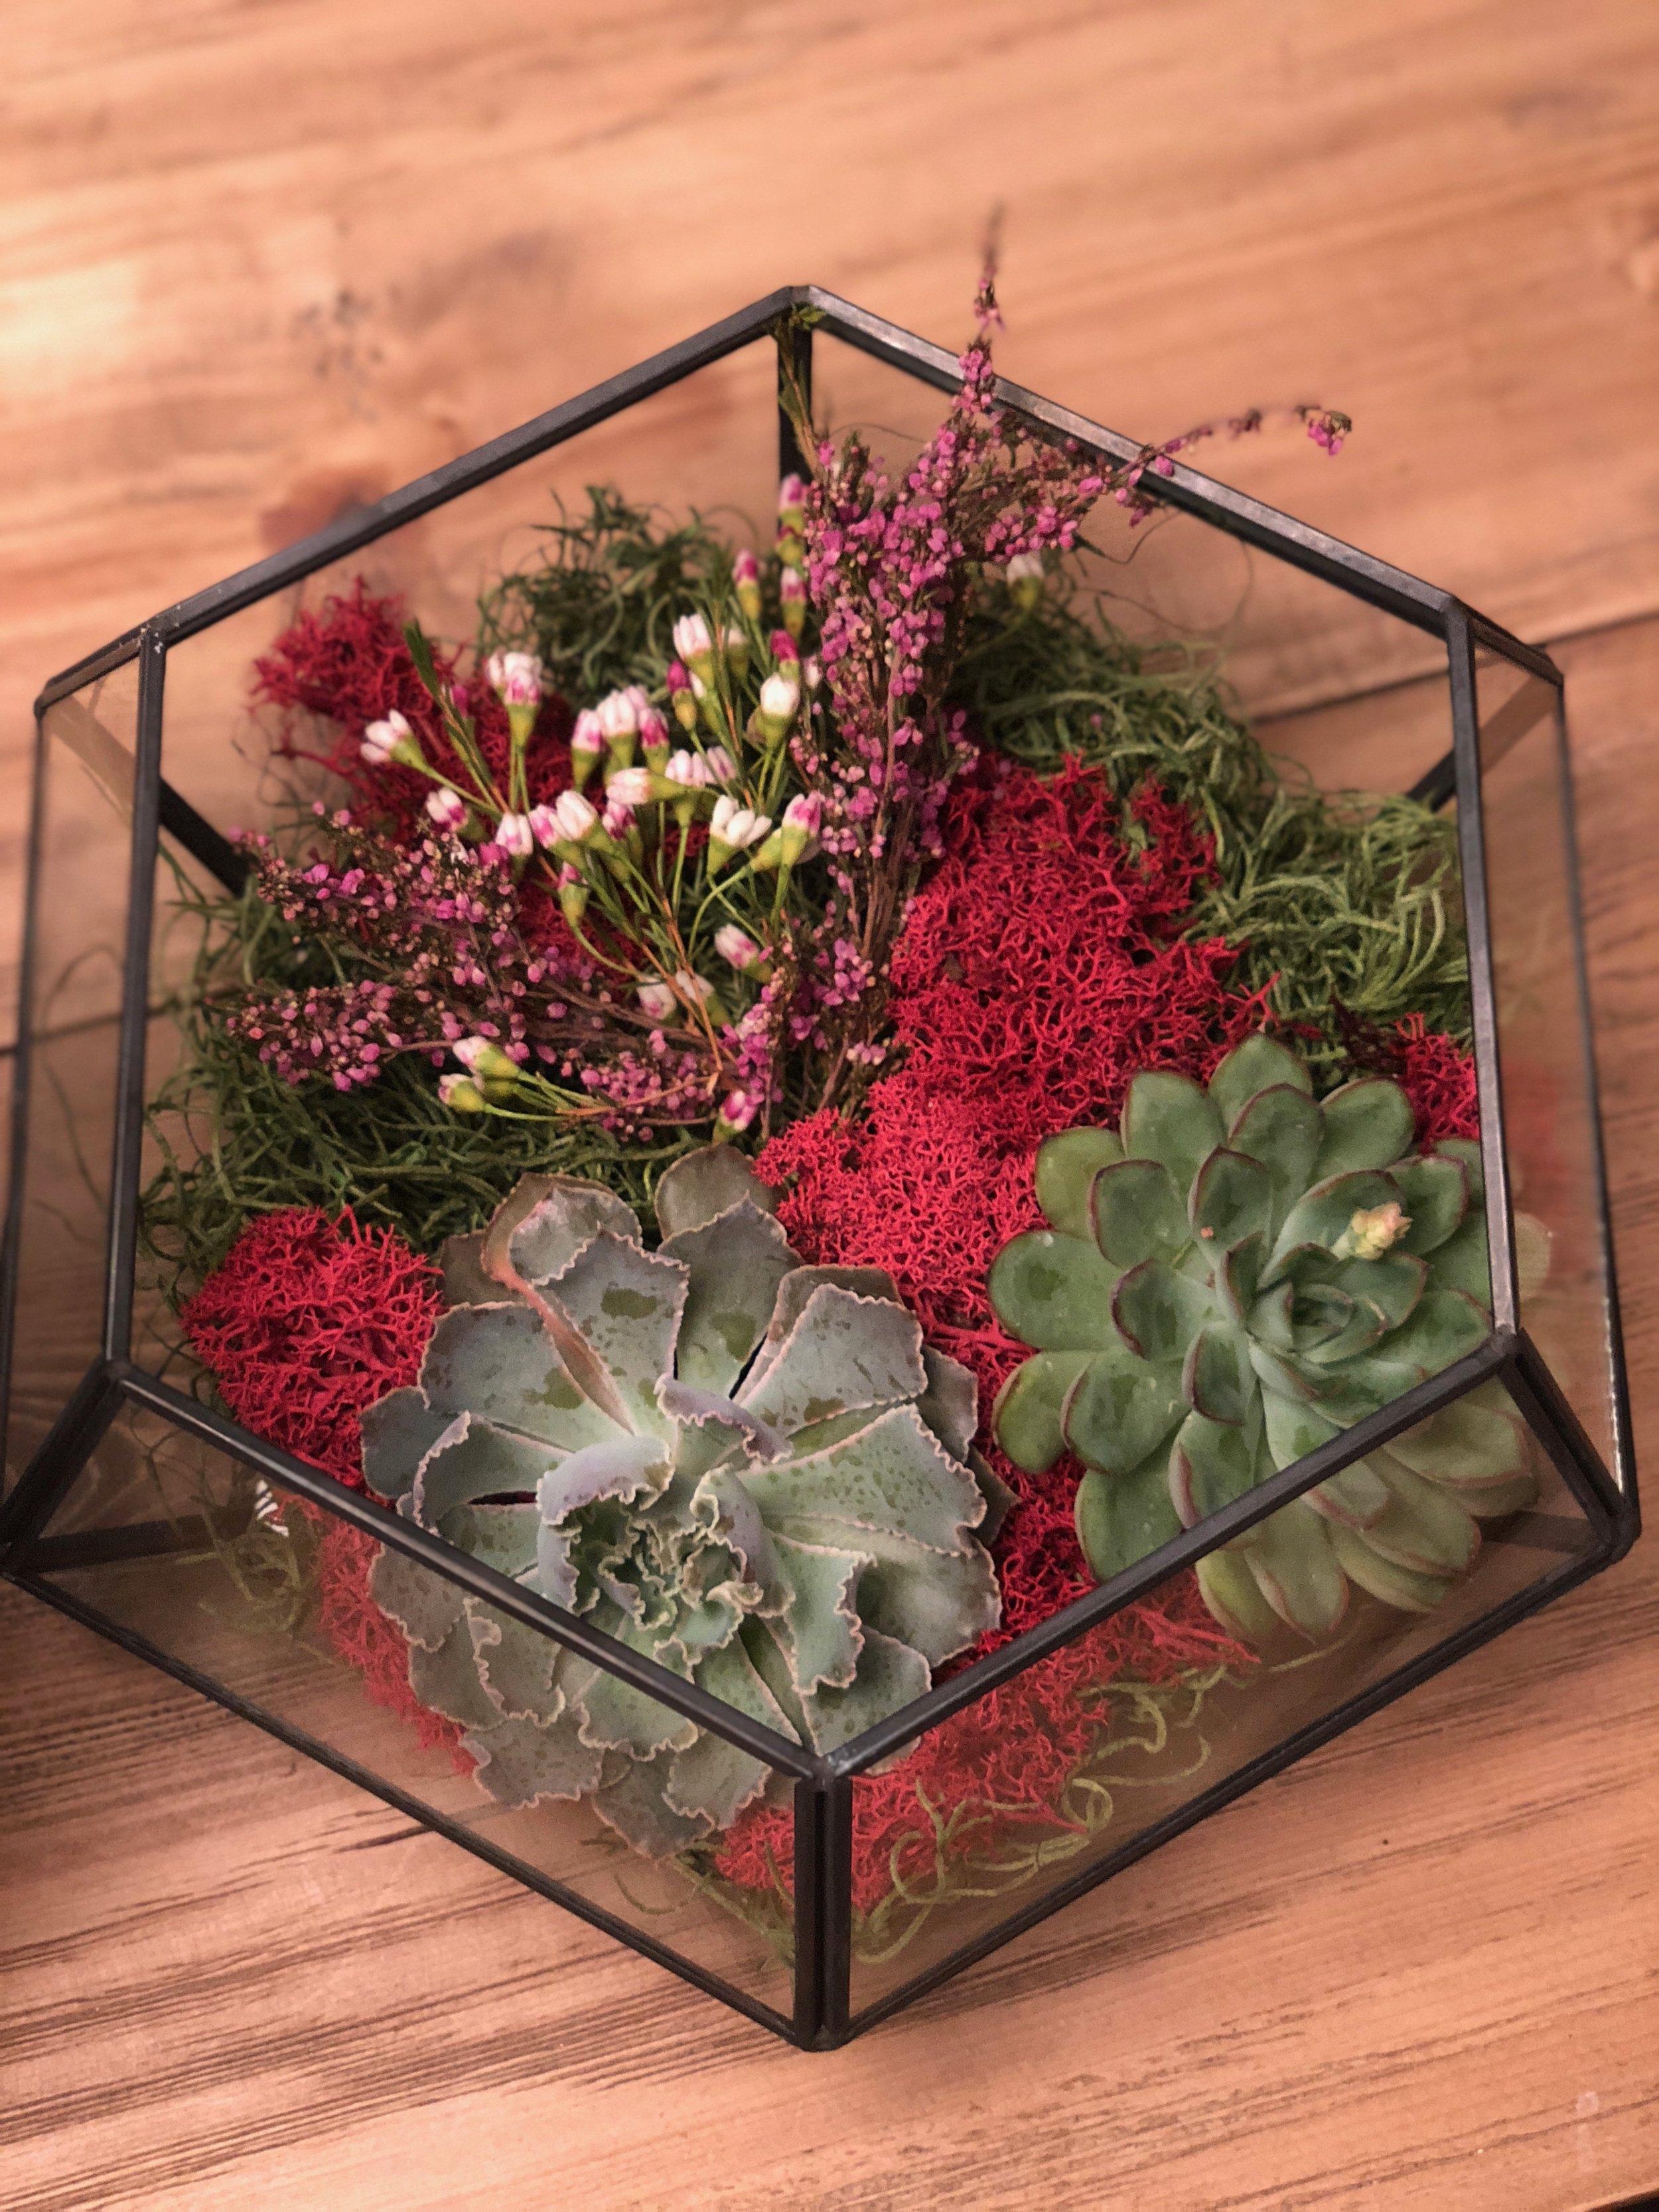 studio dan meiners wedding flowers heart and soul kcmo good earth wild hill kc florist kc wedding florist